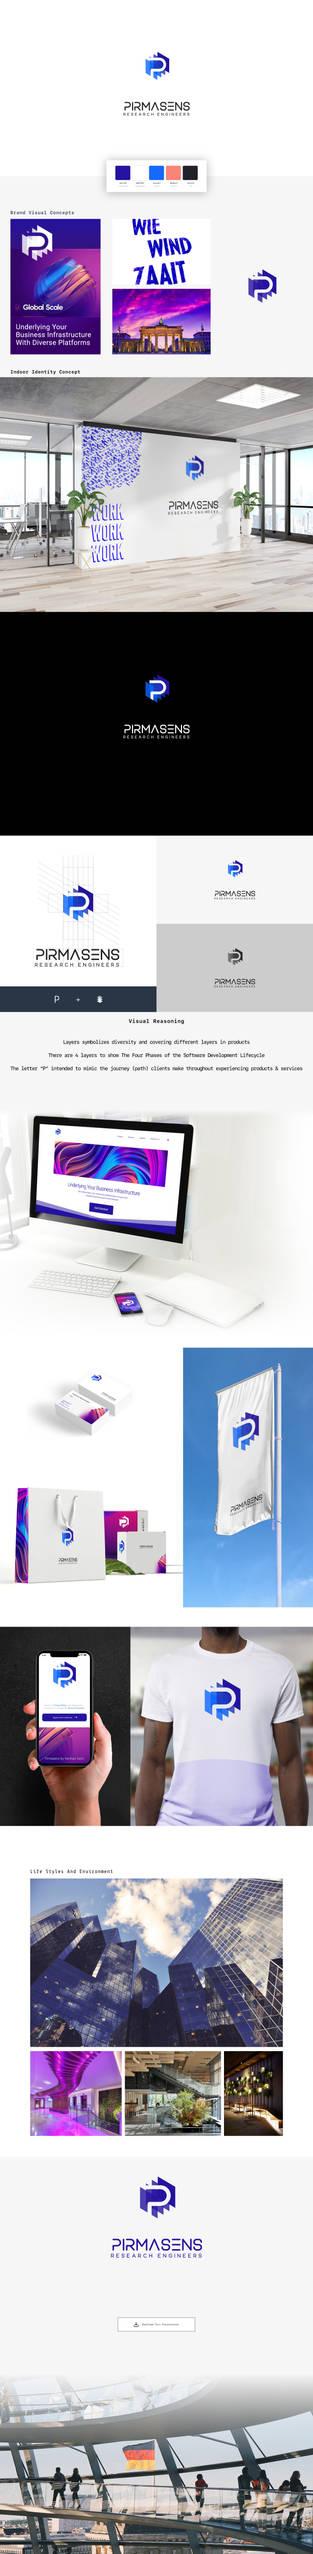 Software Company Rebrand